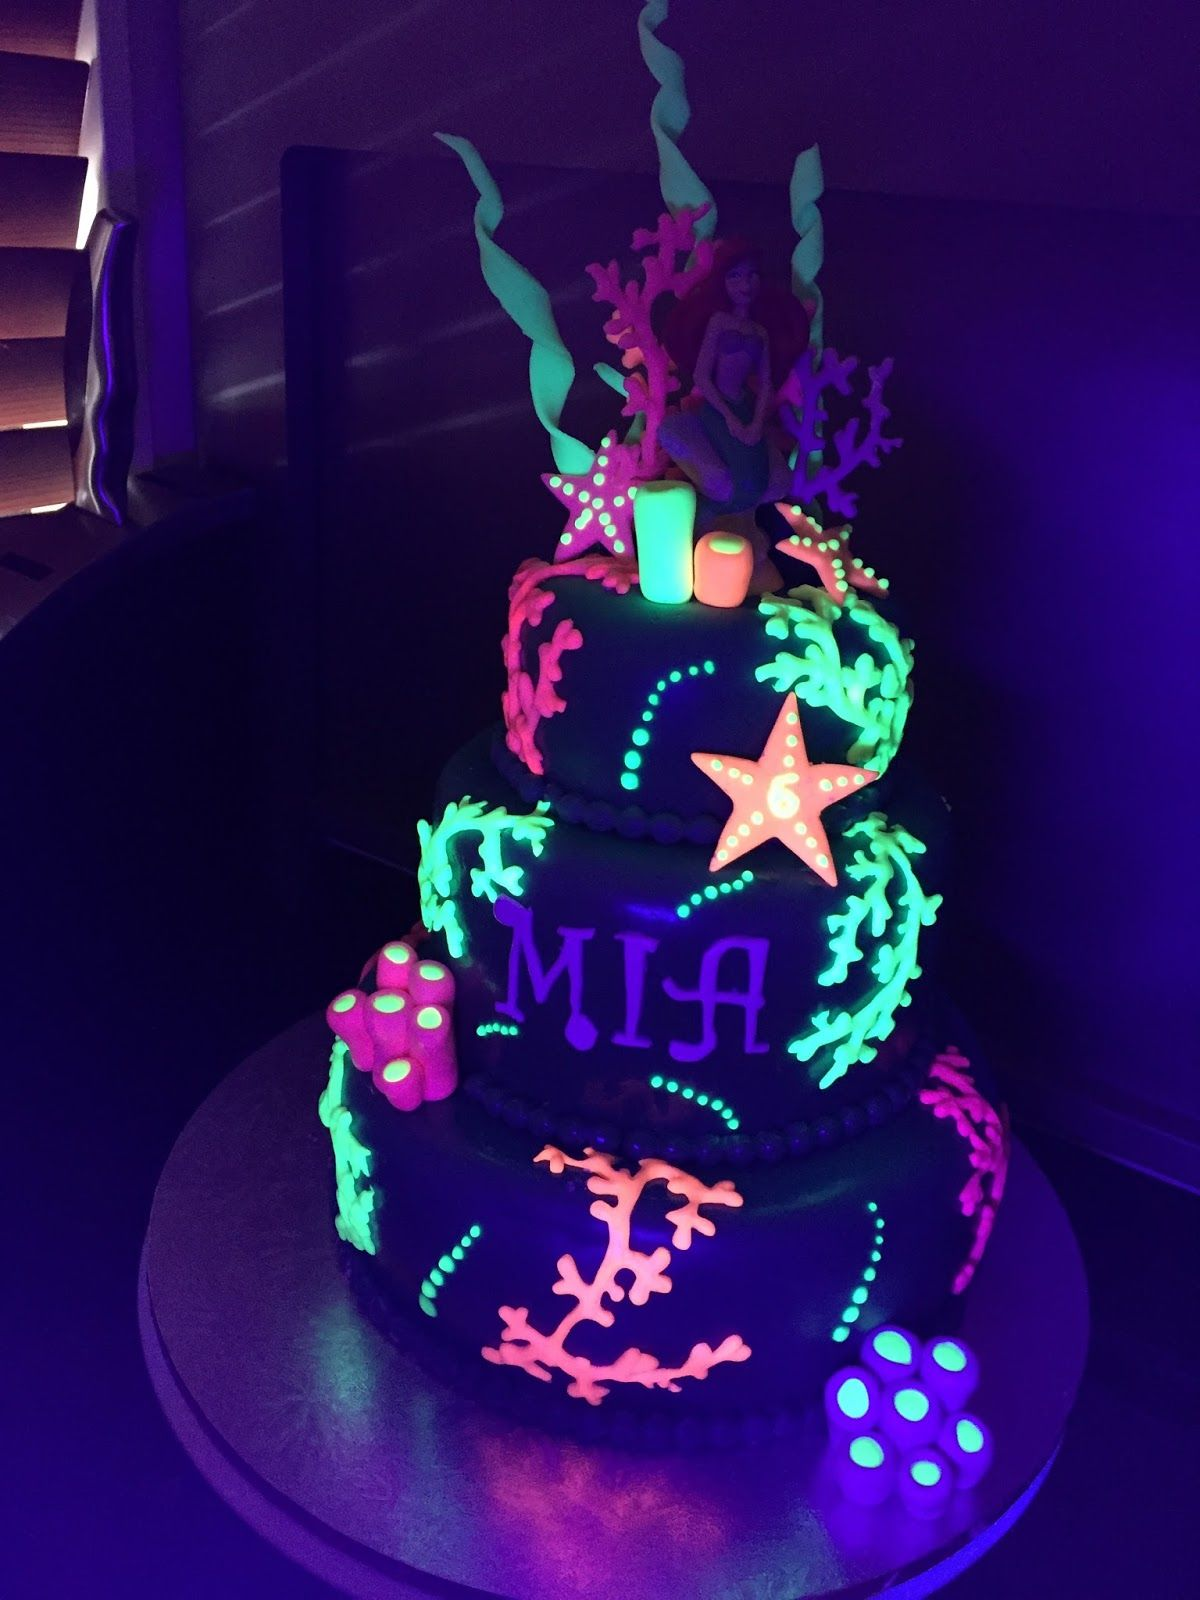 Glow In The Dark Cake Icing